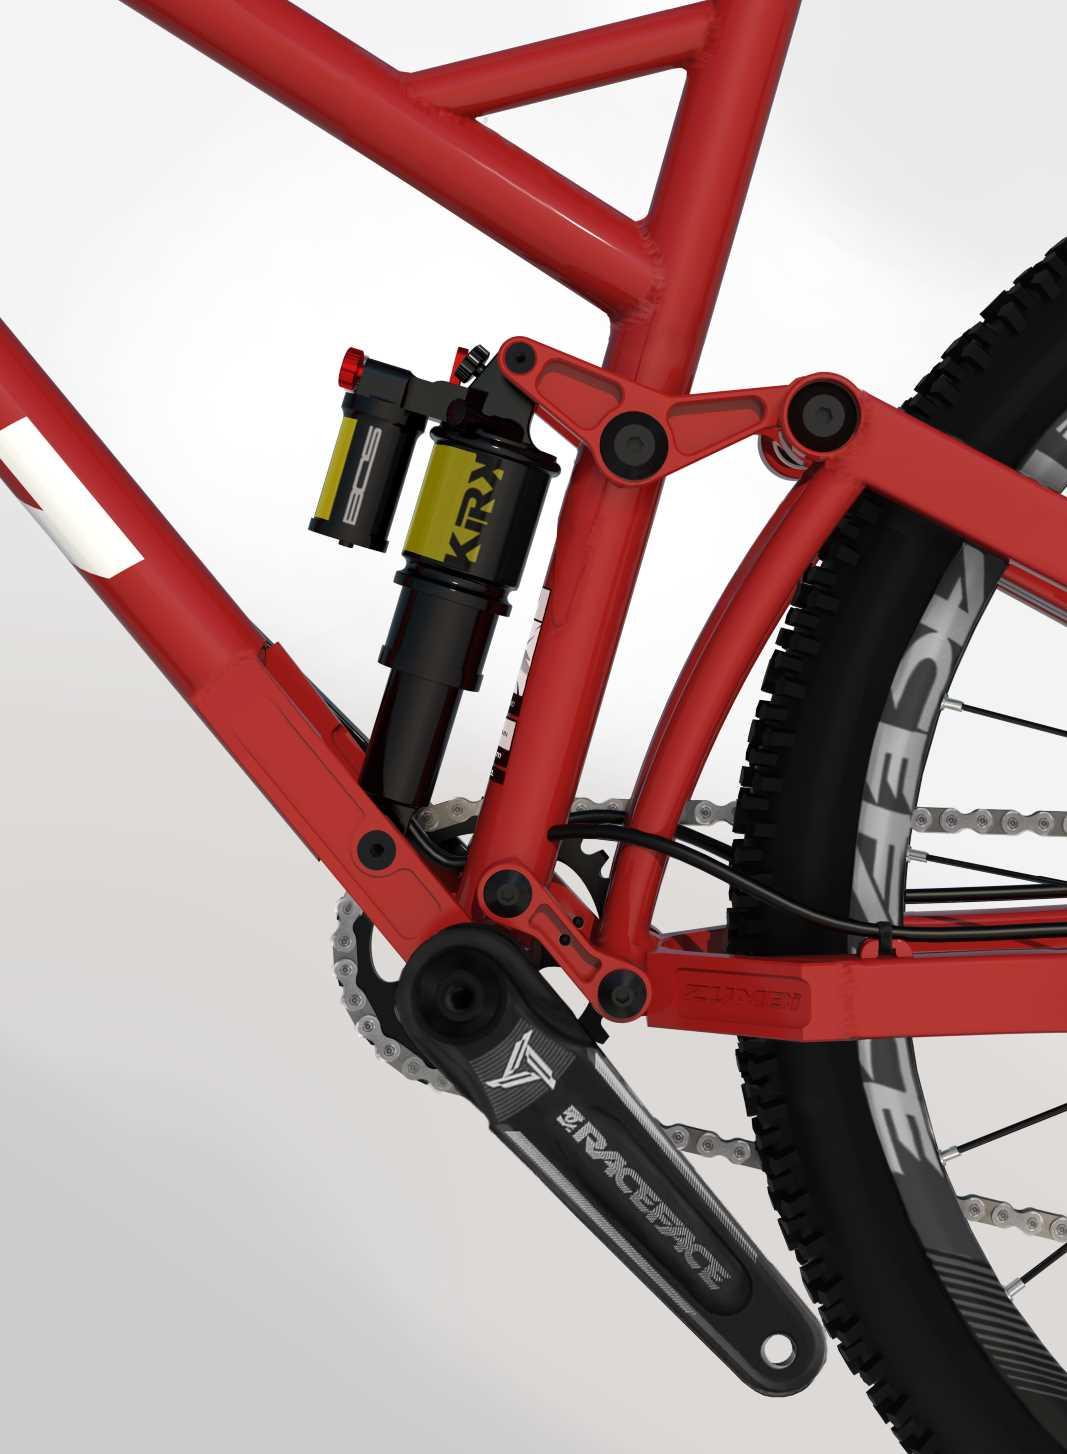 zumbi cycles 5 uk